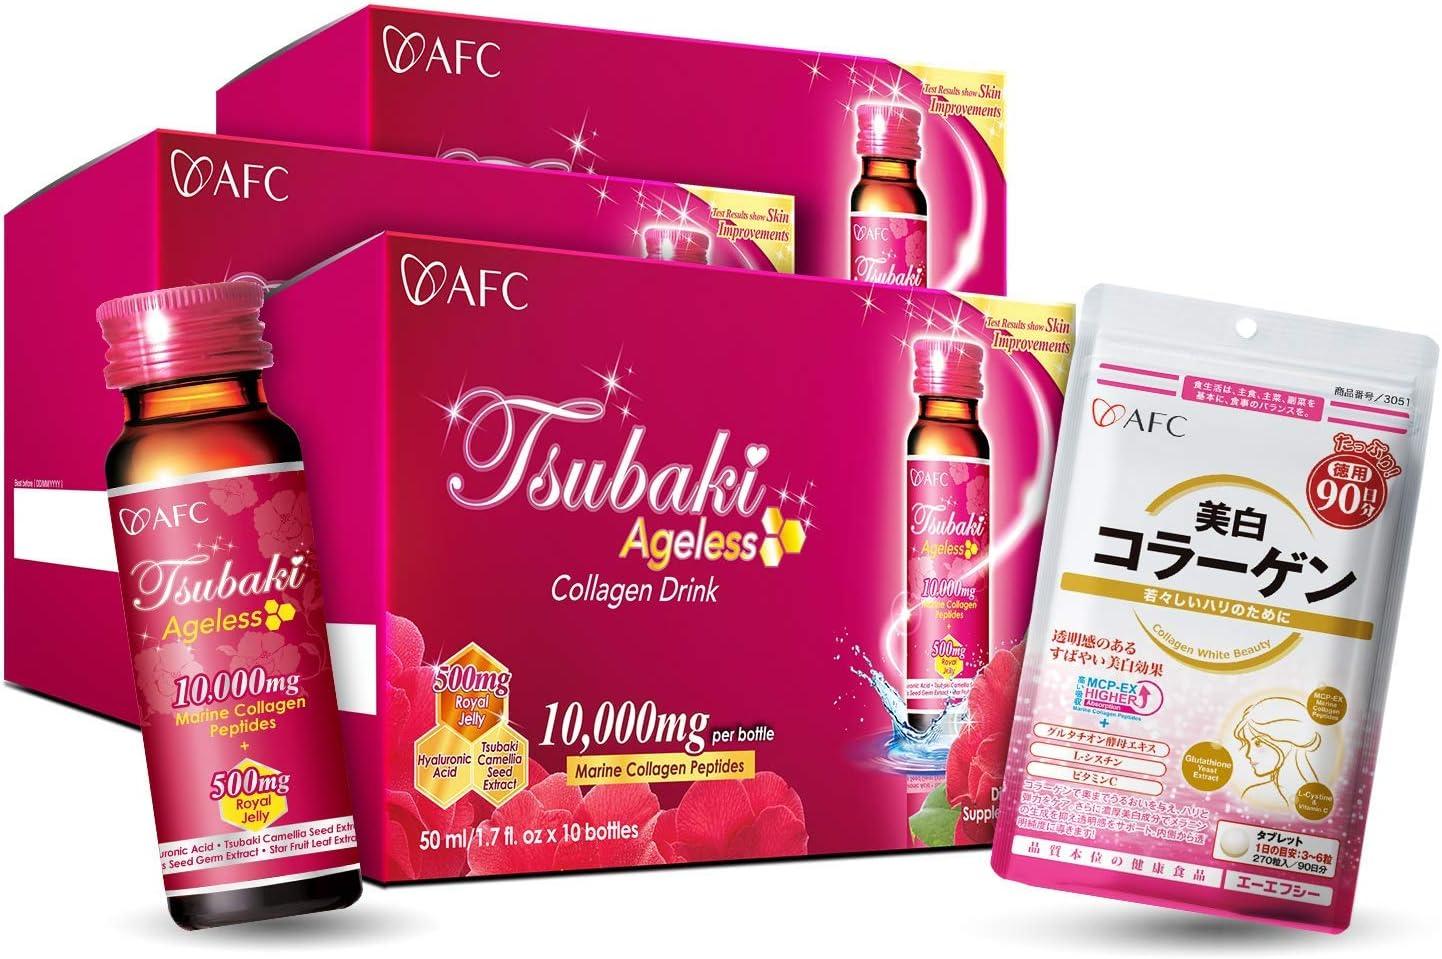 AFC Japan Tsubaki Ageless Beauty Collagen Drink 3 Boxes + Collagen White Beauty, Marine Collagen Peptide, Royal Jelly, Hyaluronic Acid, Glutathione, for Skin Revitalization, Firmness & Whitening